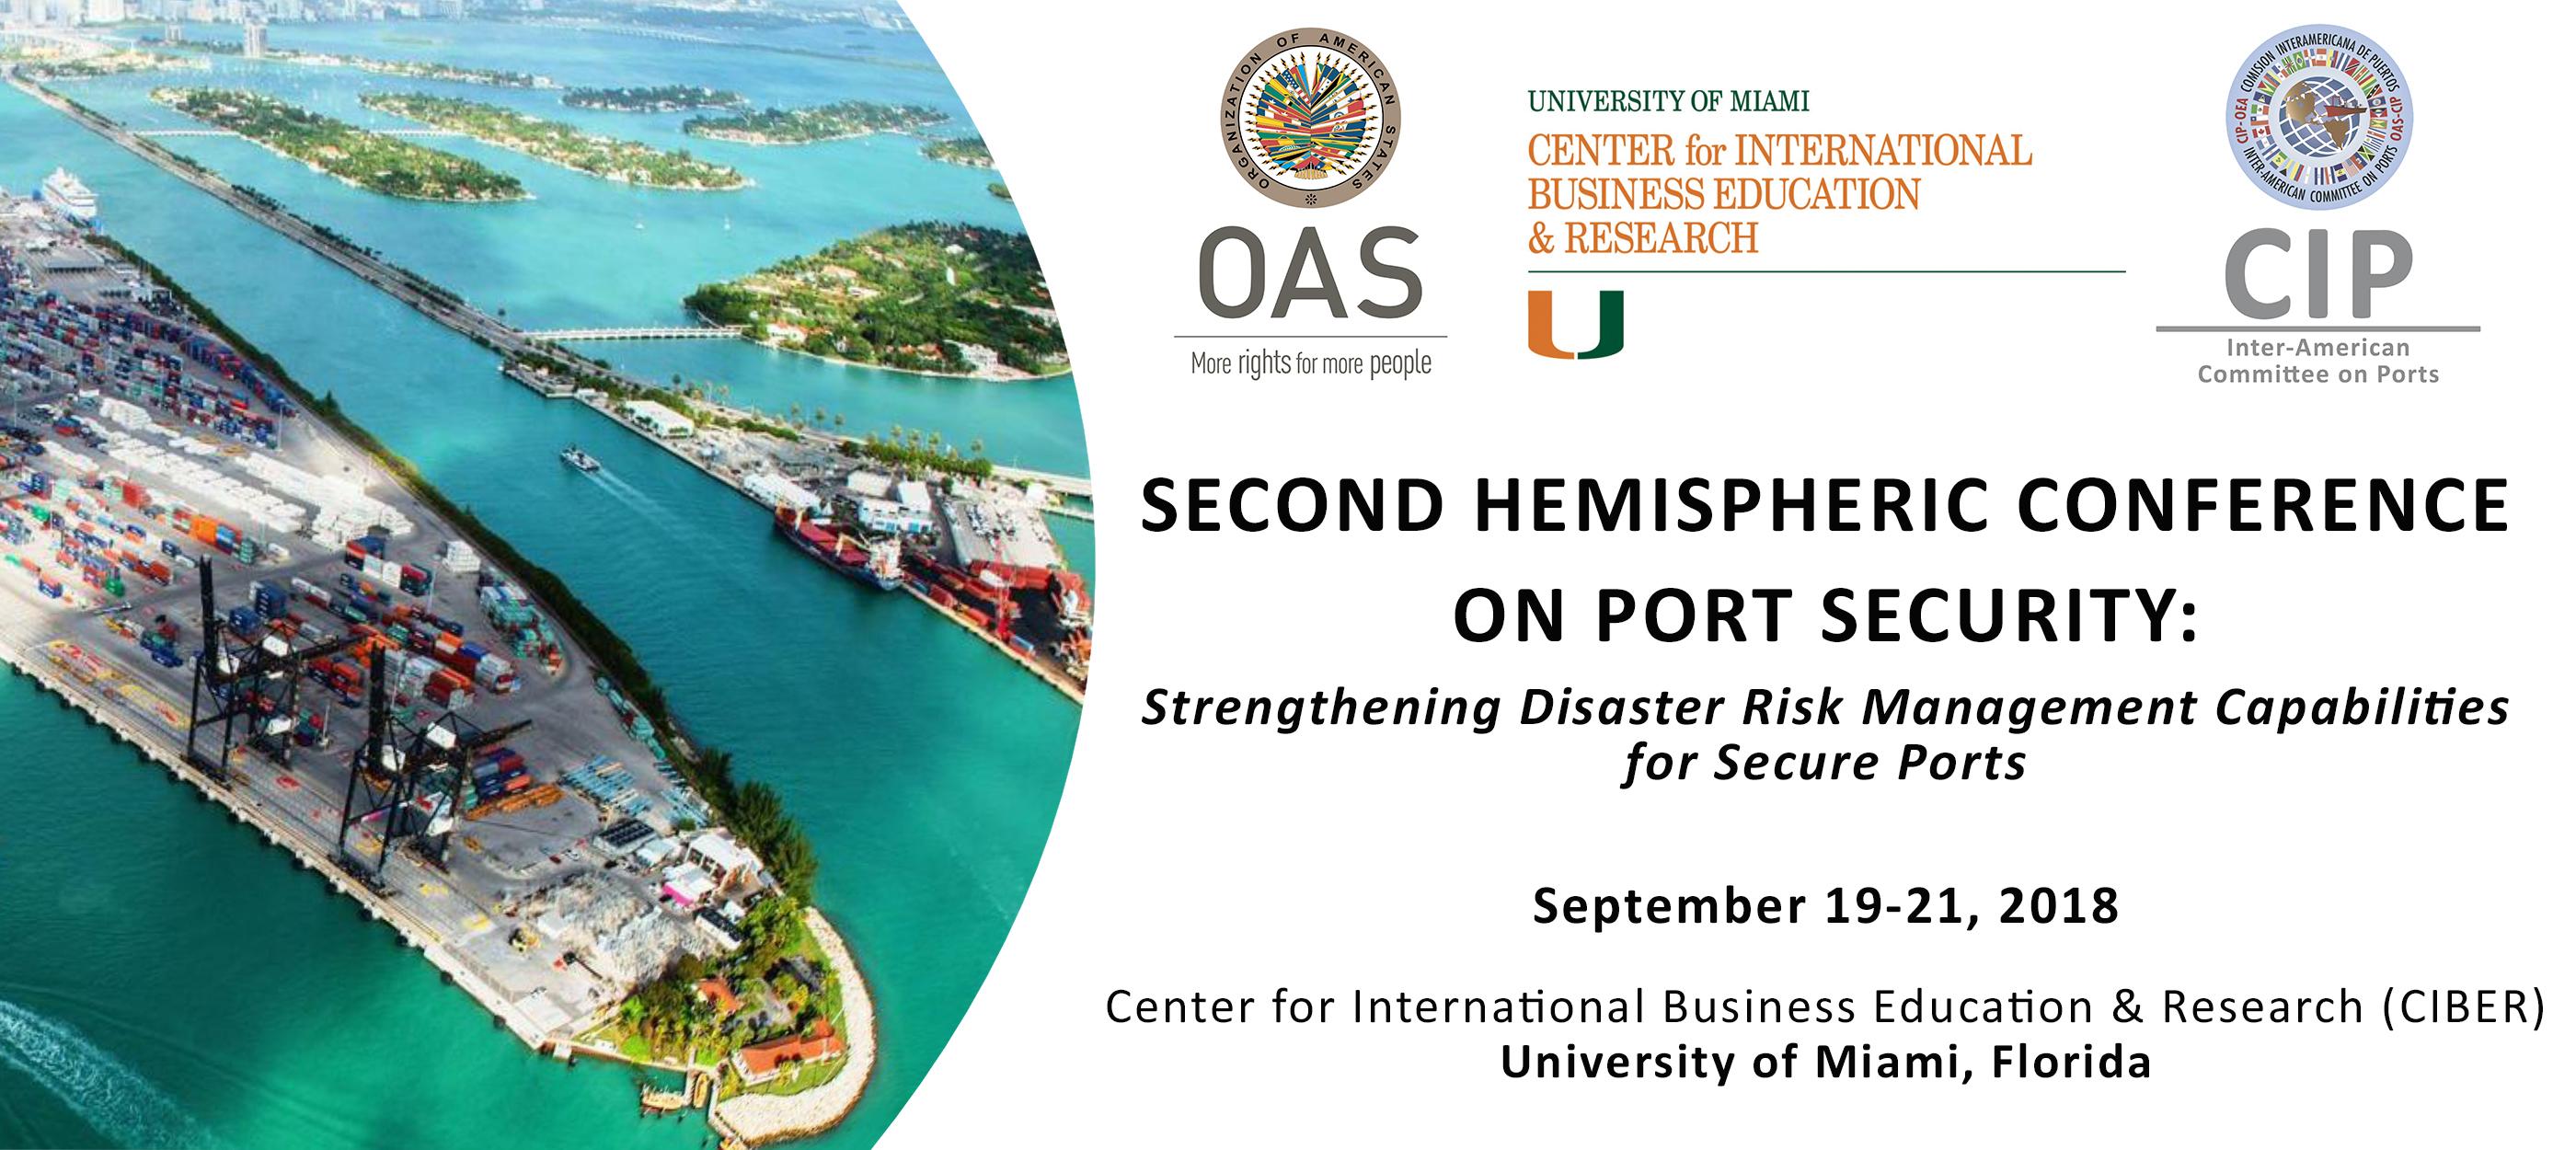 Second Hemispheric Conference on Port Security